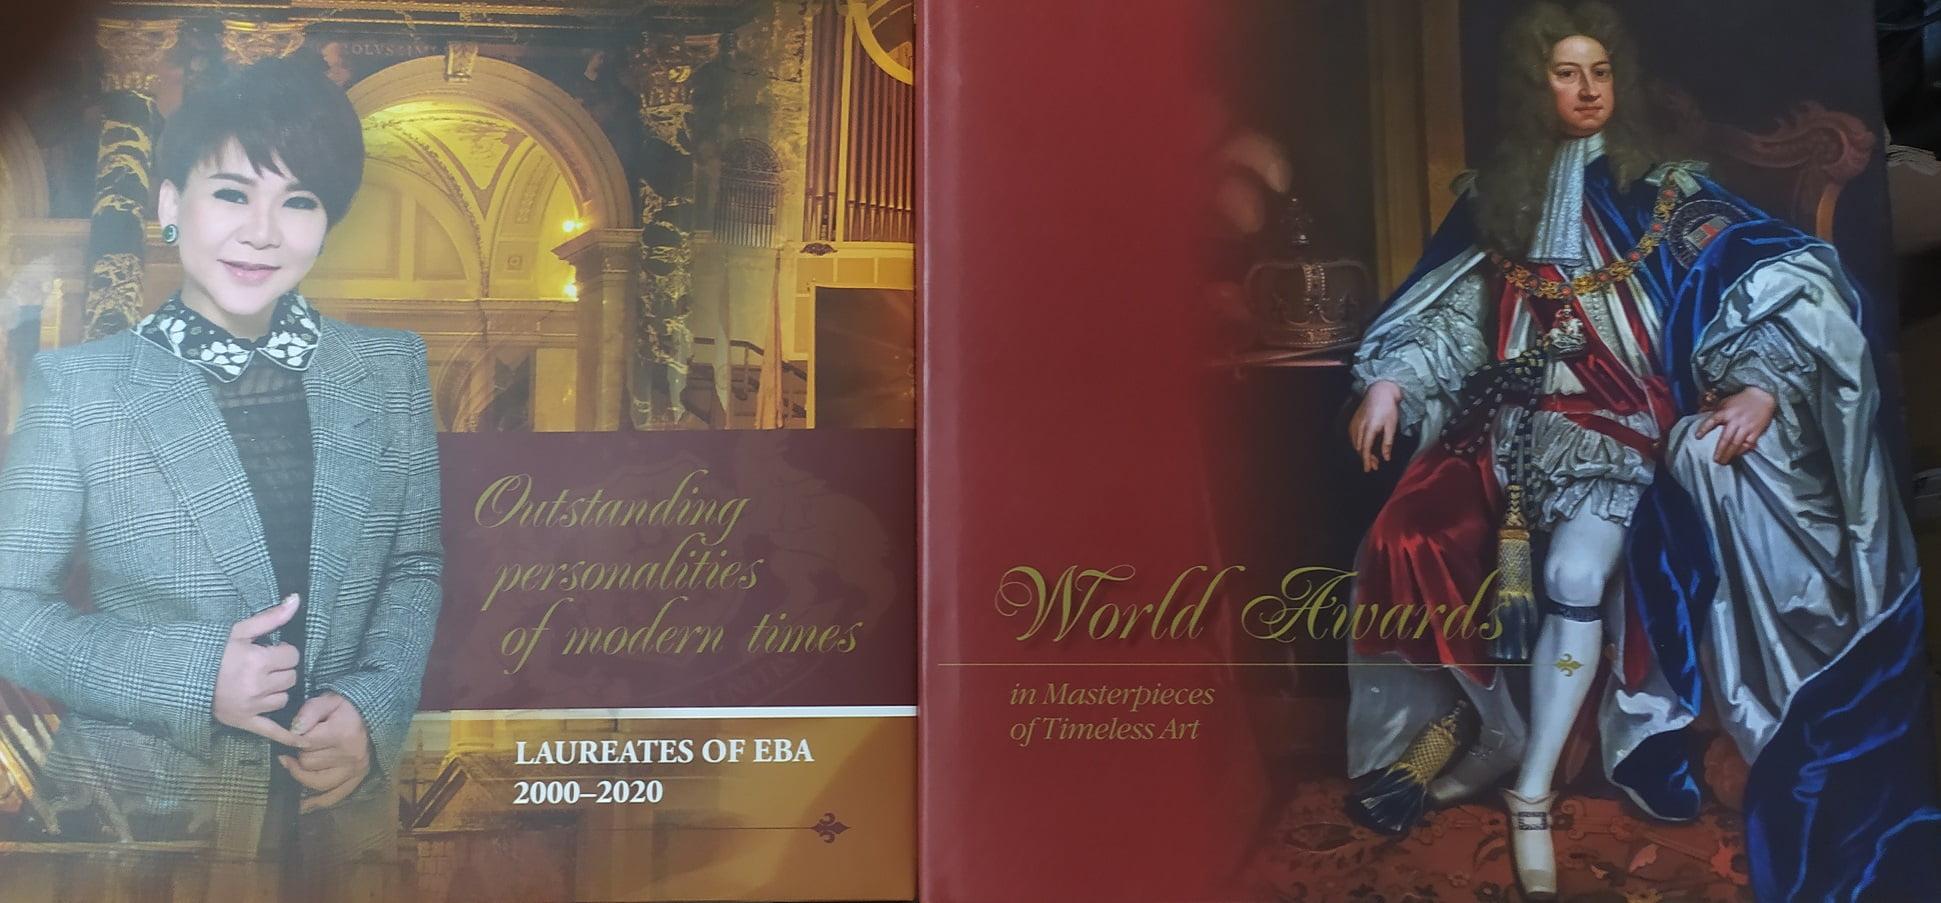 World Awards in Masterpieces of Timeless Art. Outstanding personalities of modern times Laureates of EBA 2000-2020 (комплект из 2х книг)